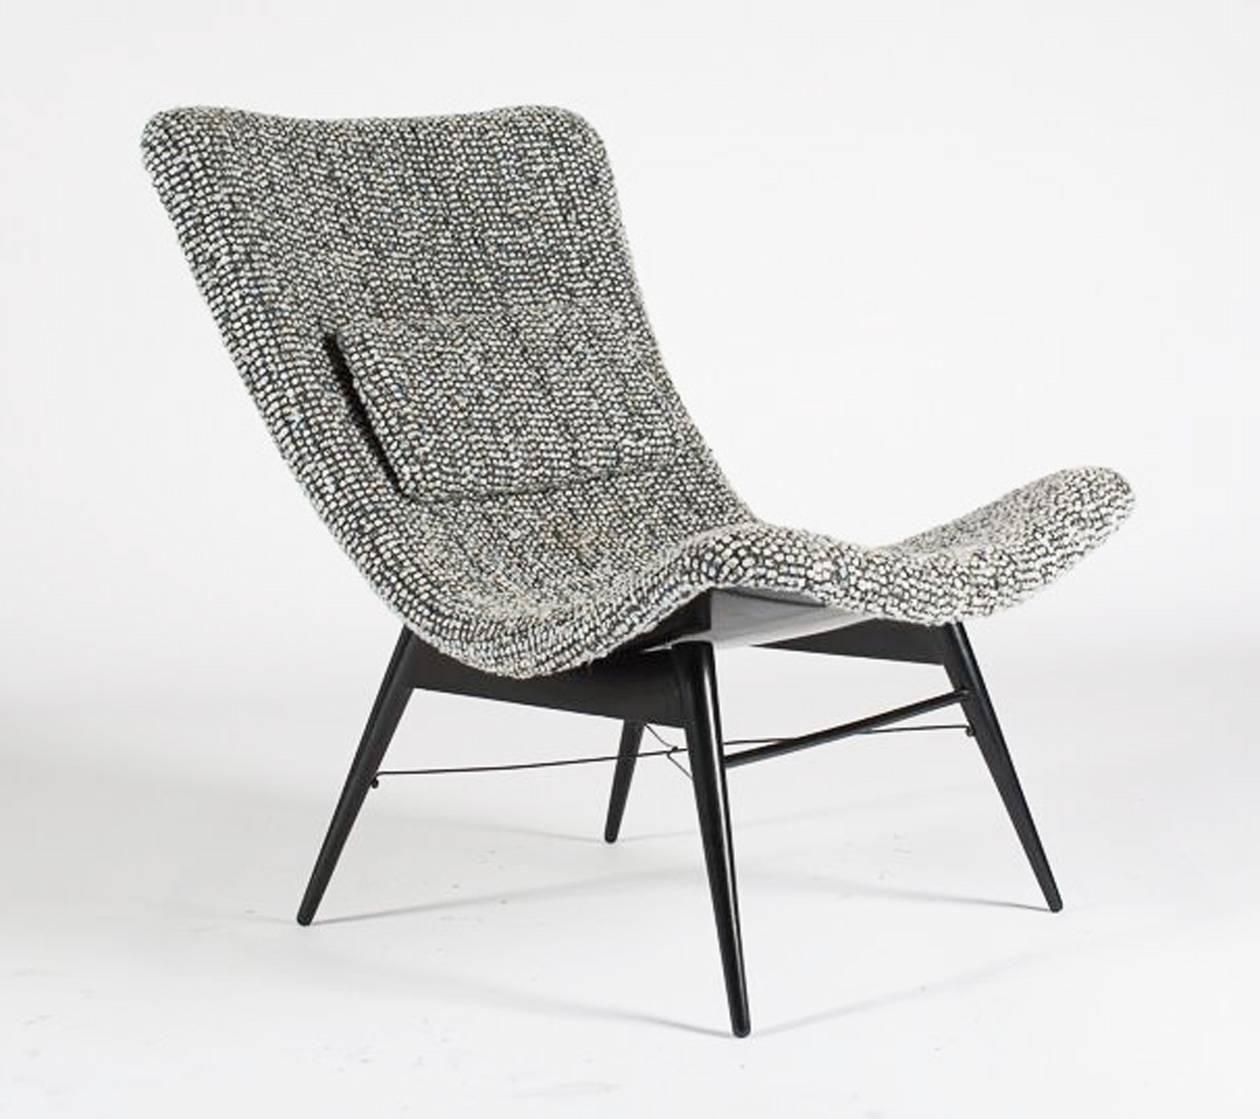 Lounge tv chair by miroslav navratil 2